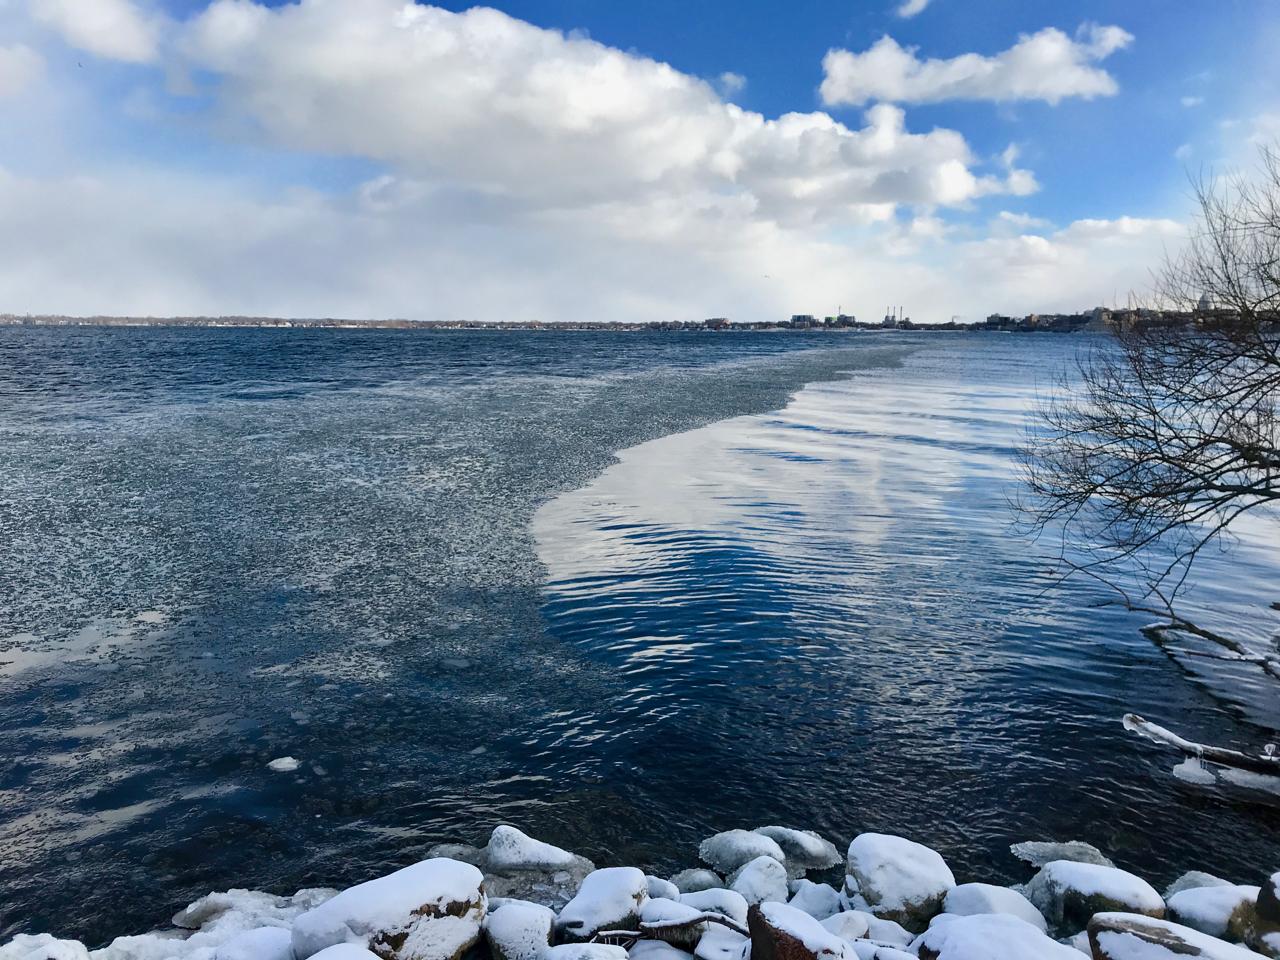 Windbreak. Picnic Point. Madison, Wisconsin. December 2017. © William D. Walker